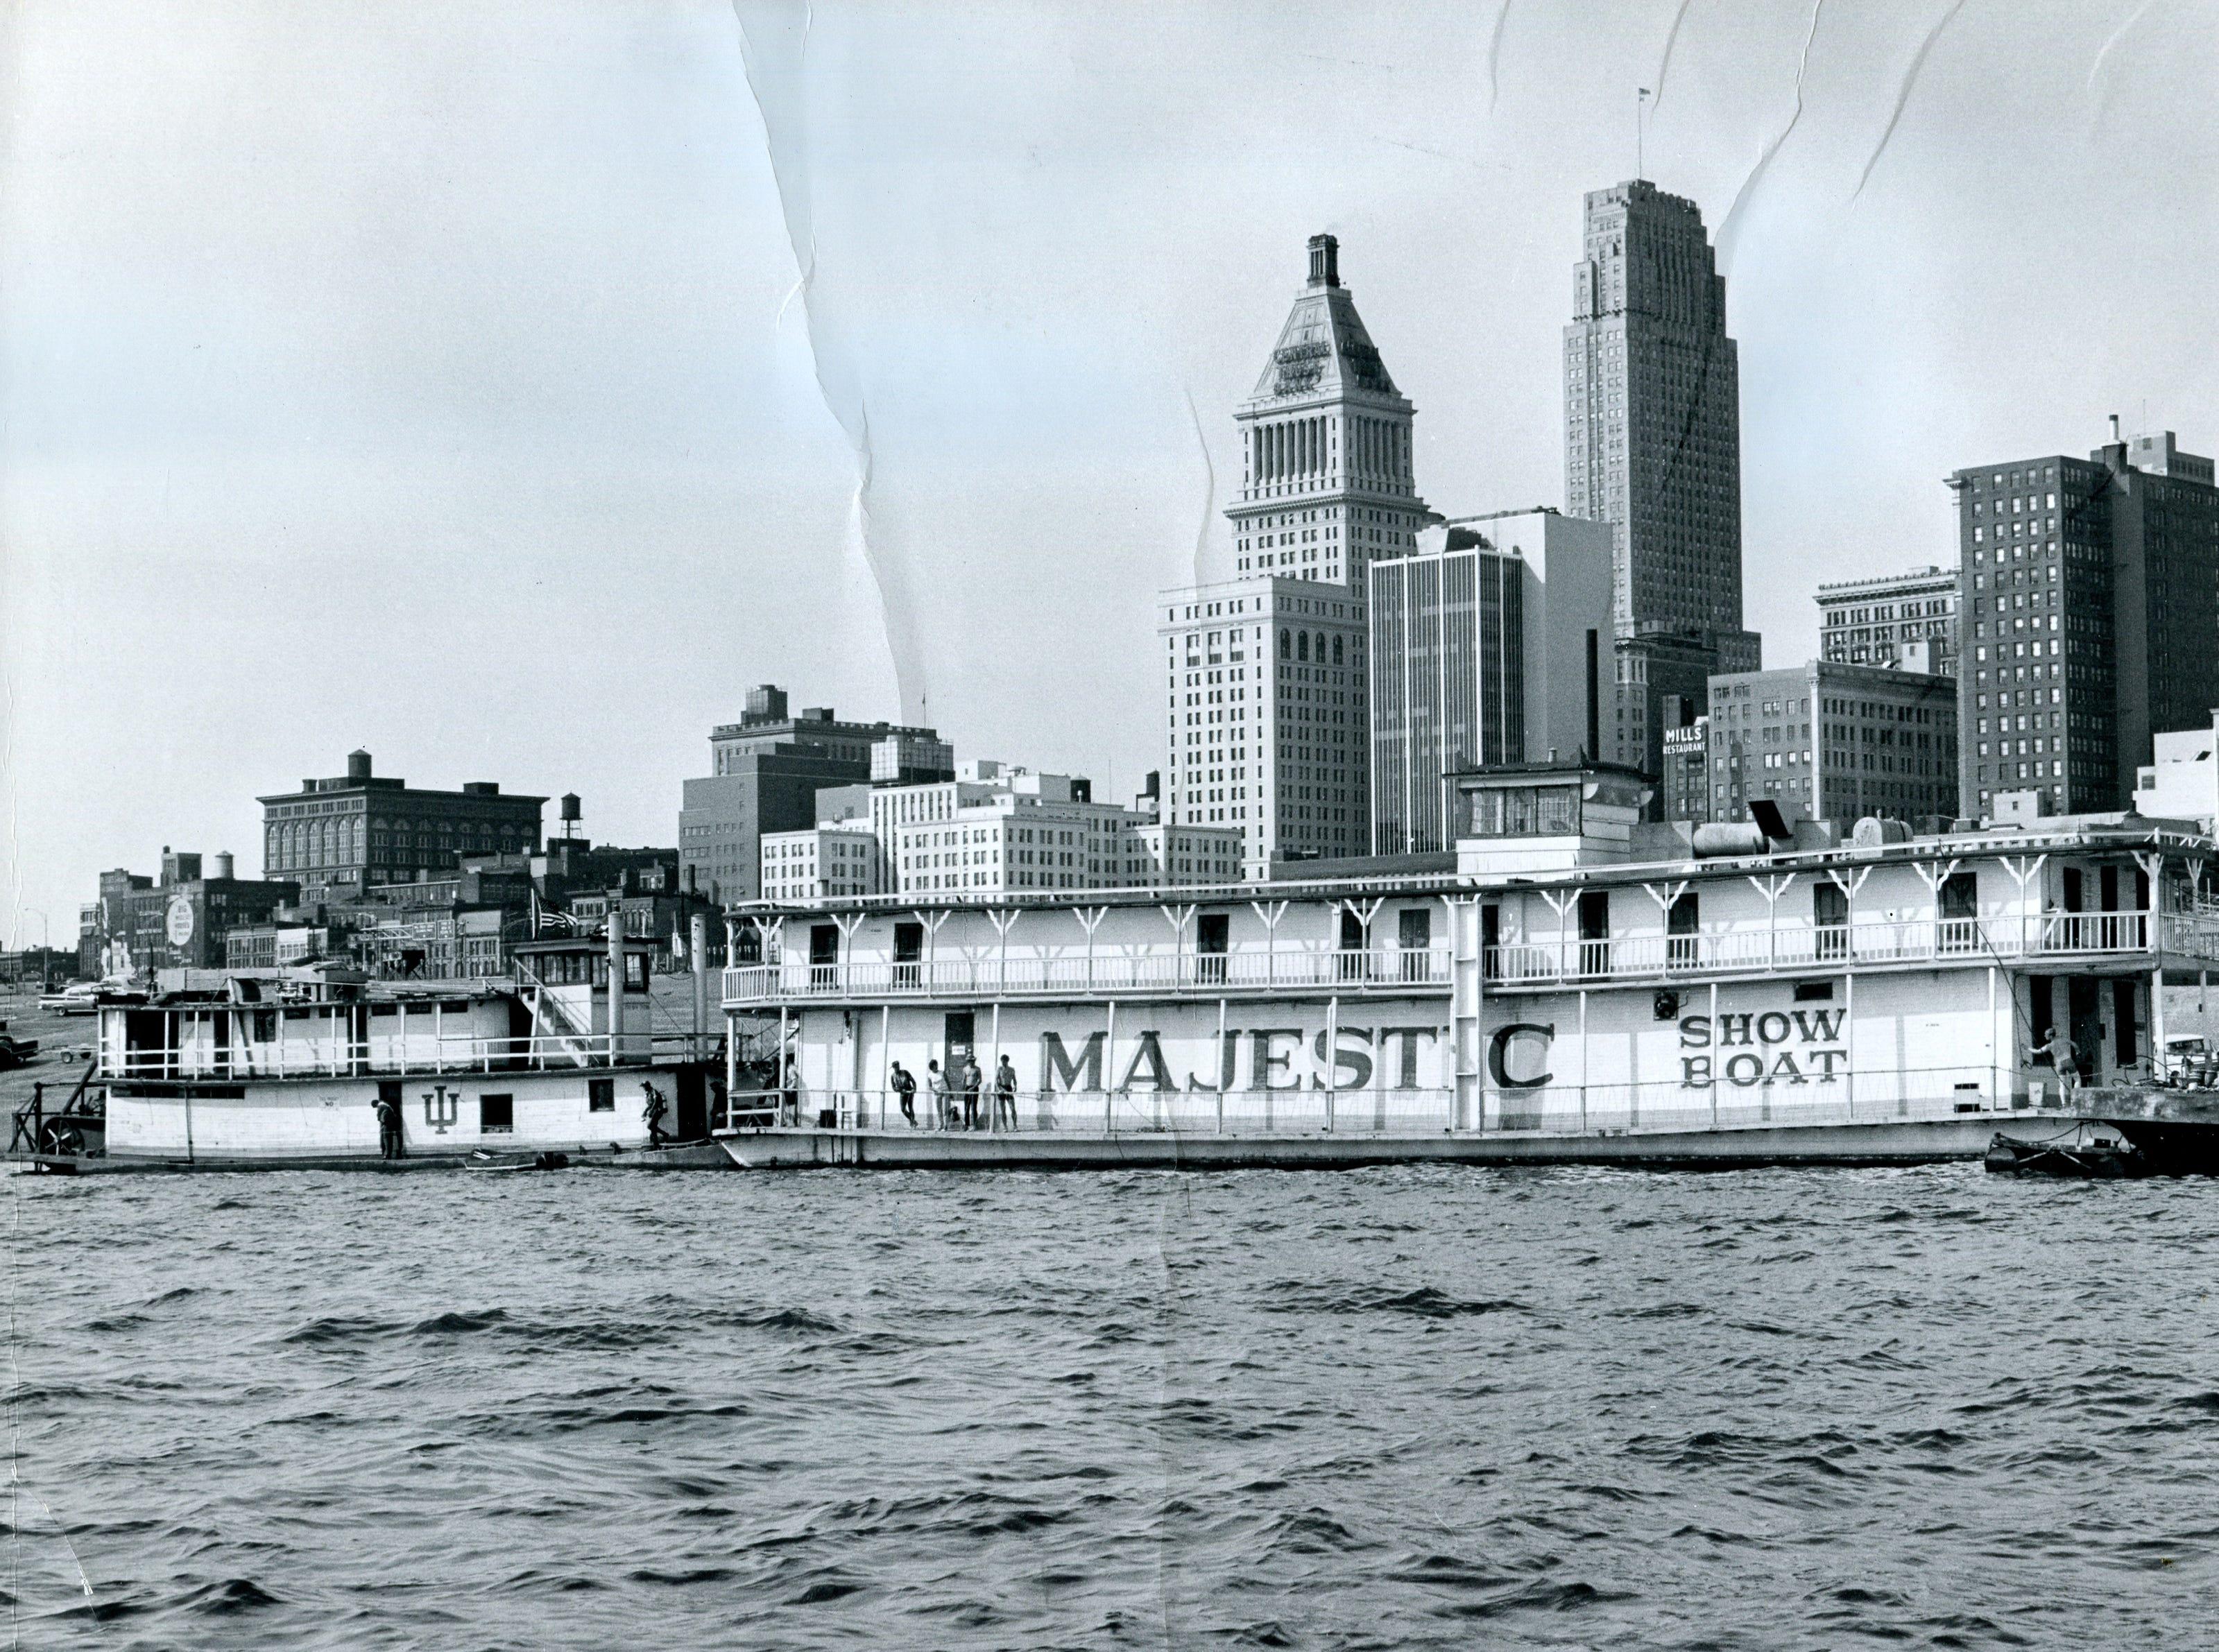 Showboat Majestic at the Cincinnati riverfront October 1967.